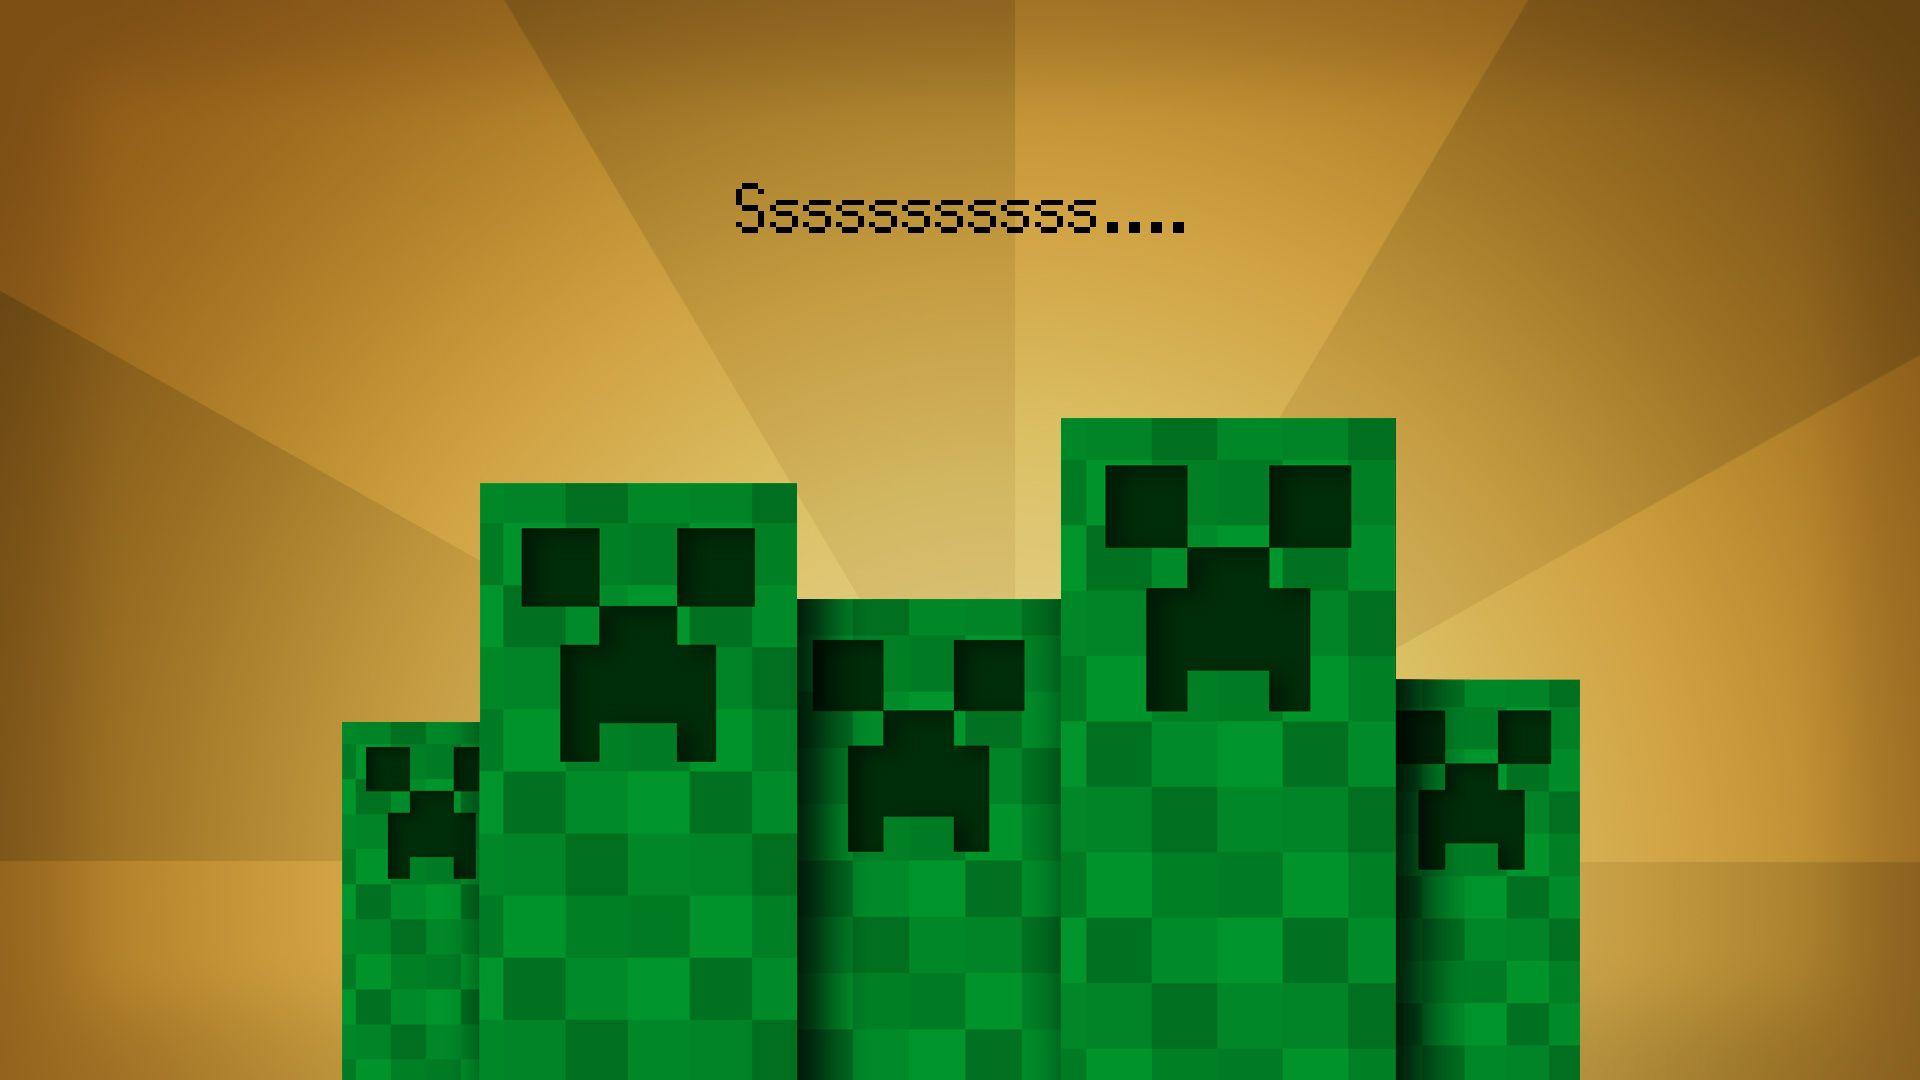 Creeper Minecraft Cool Backgrounds - http://www.rourkelabds.com/creeper